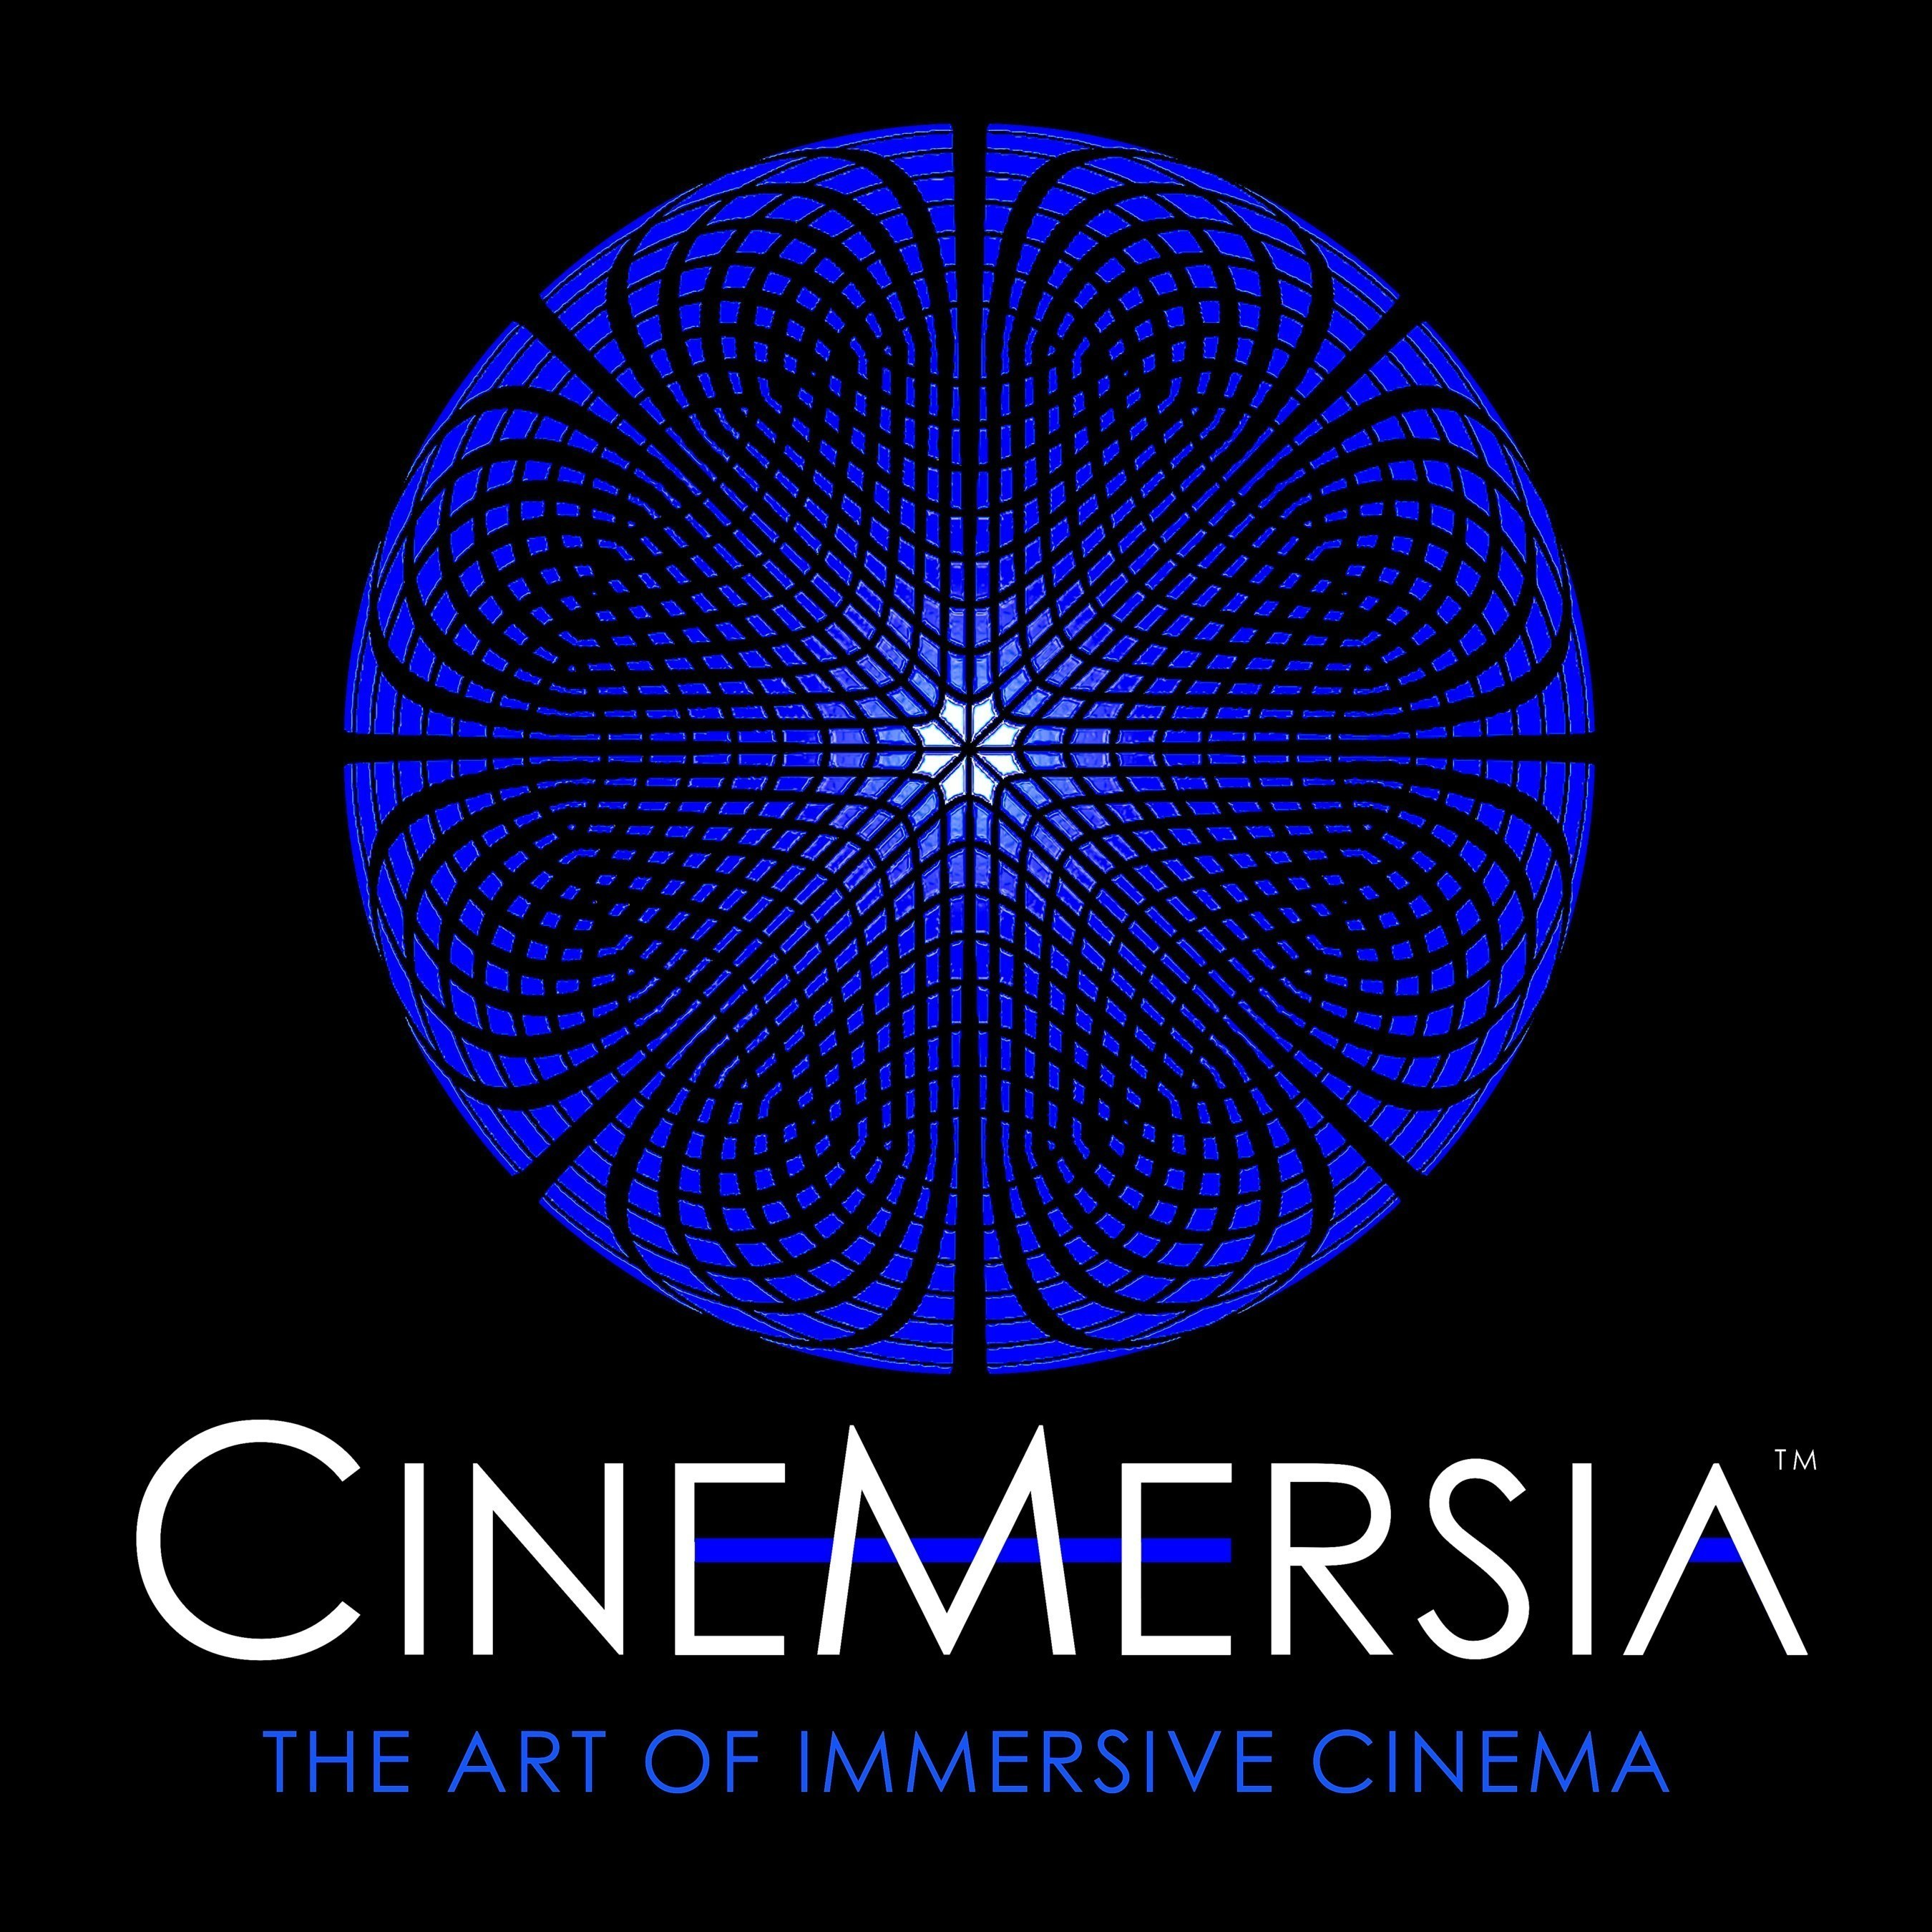 CINEMERSIA. The Art of Immersive Cinema